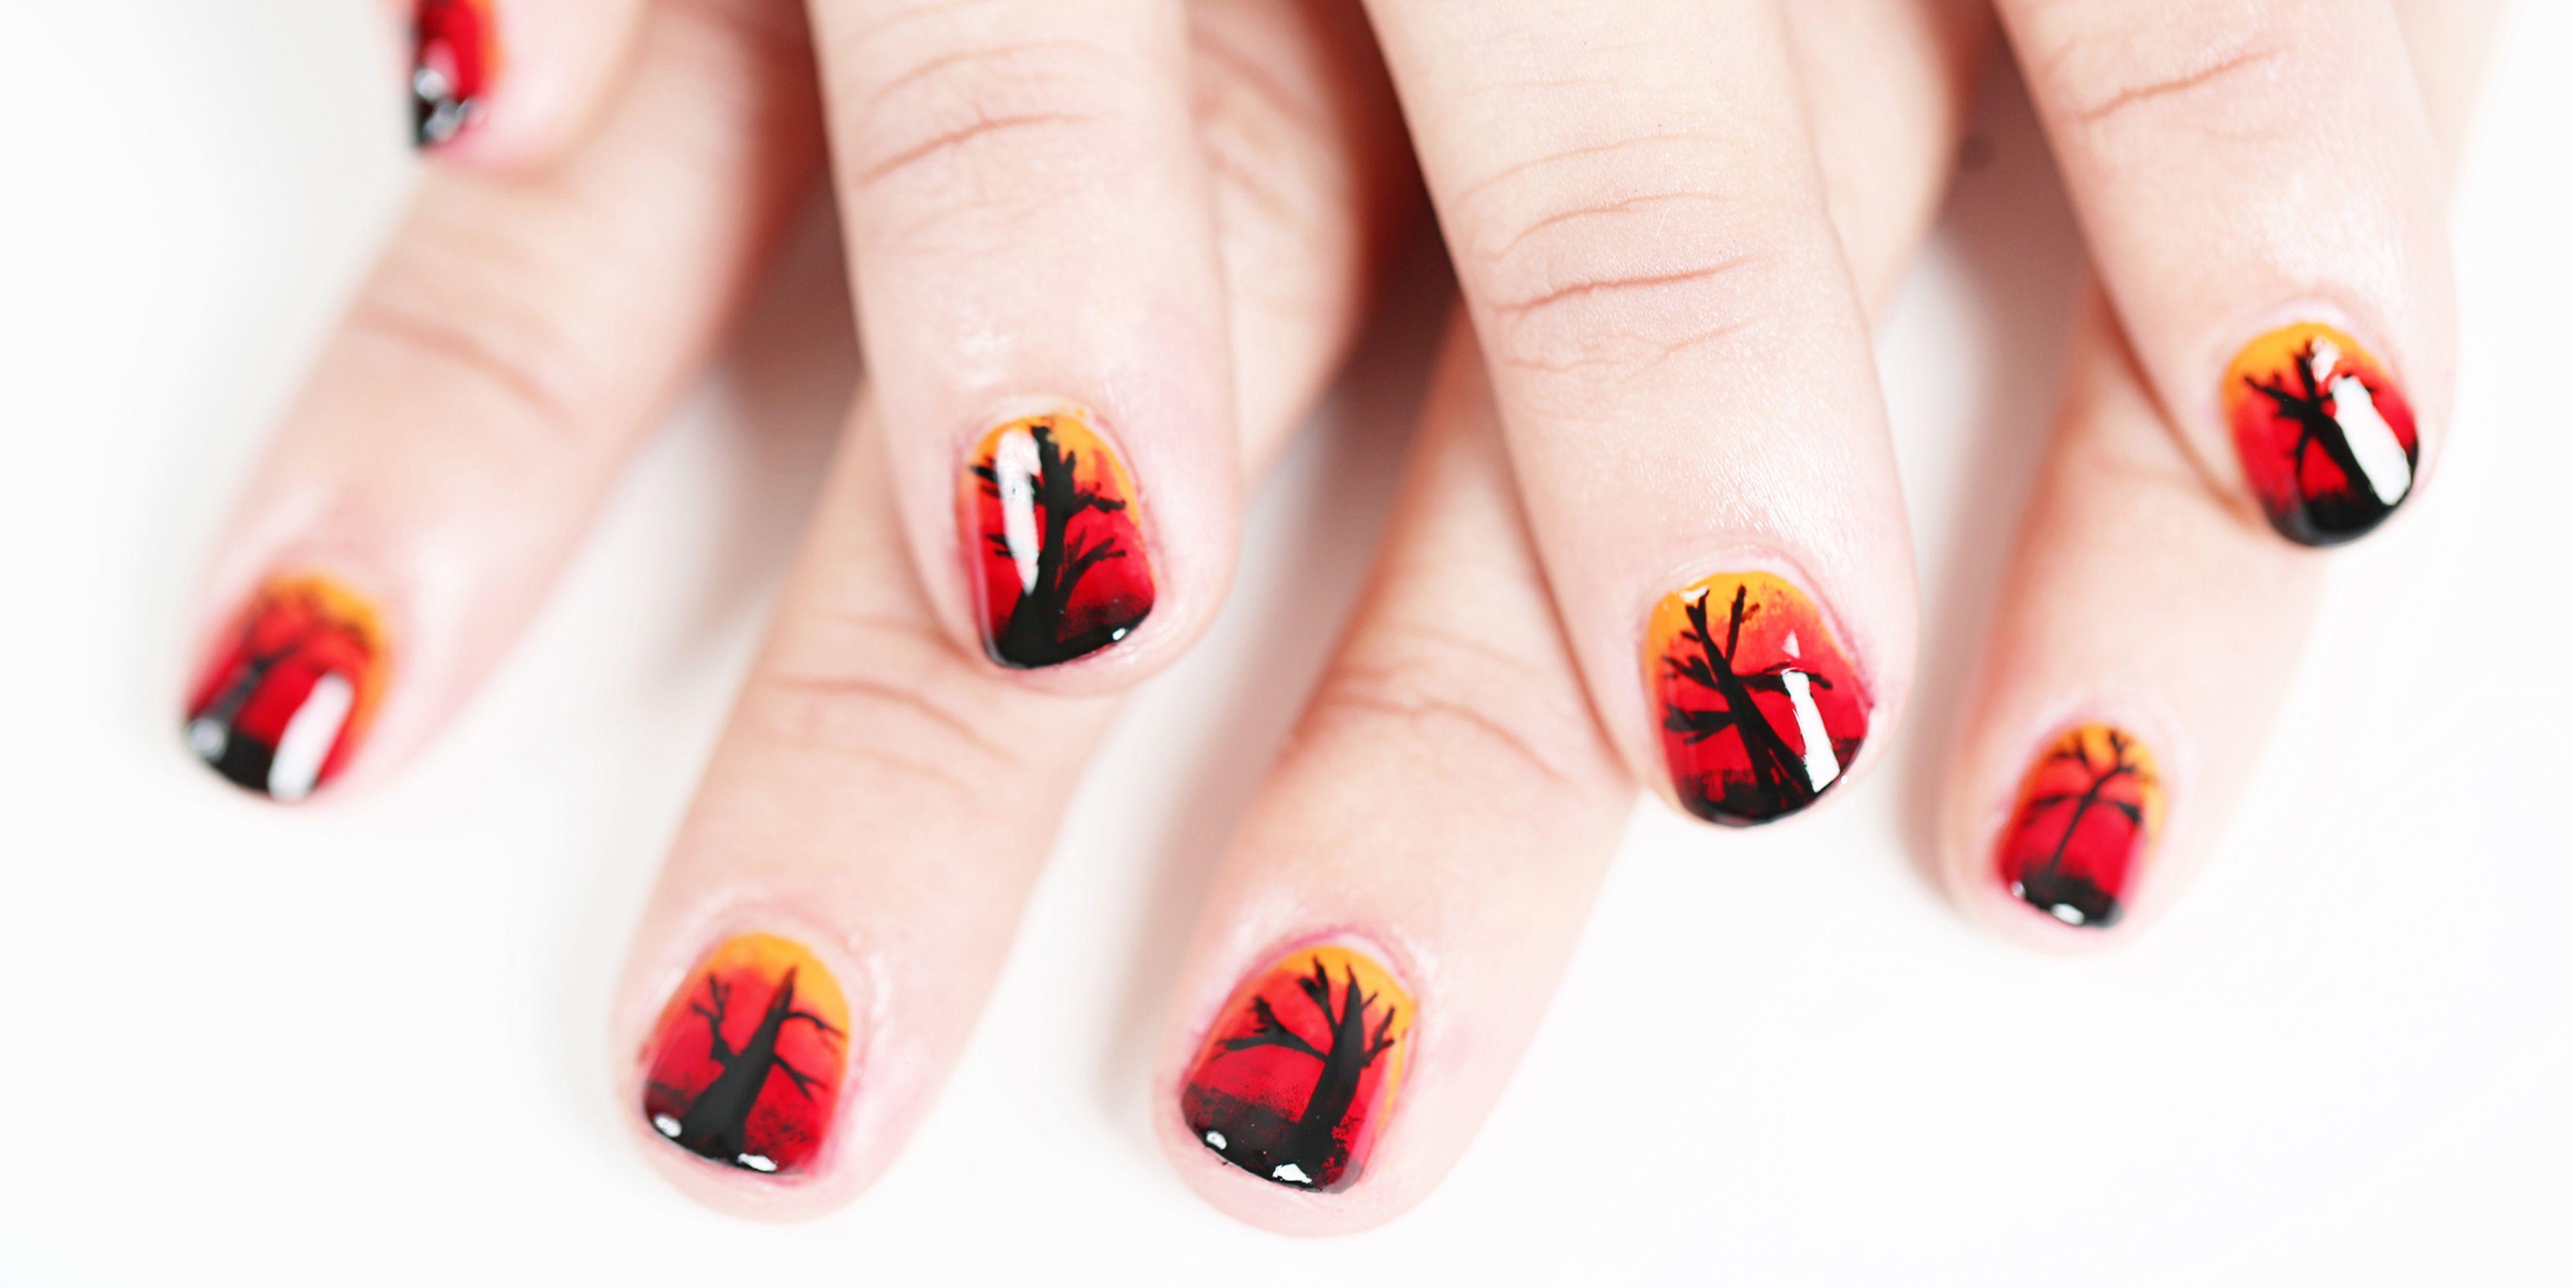 33 Cute Halloween Nail Art Ideas - Best Designs for Halloween Nails